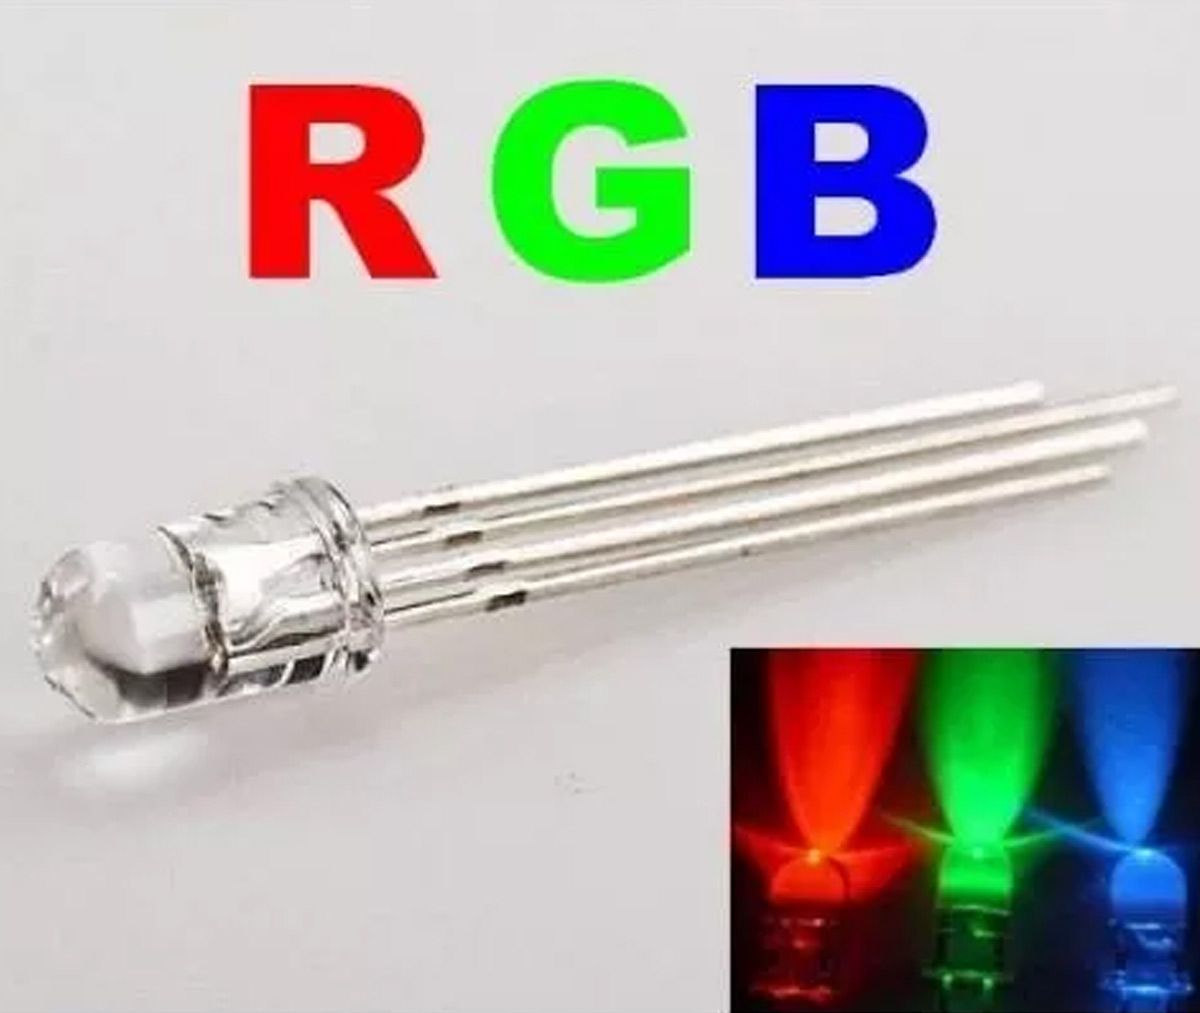 100 x Led 5mm RGB 4 Terminais - Catodo Comum